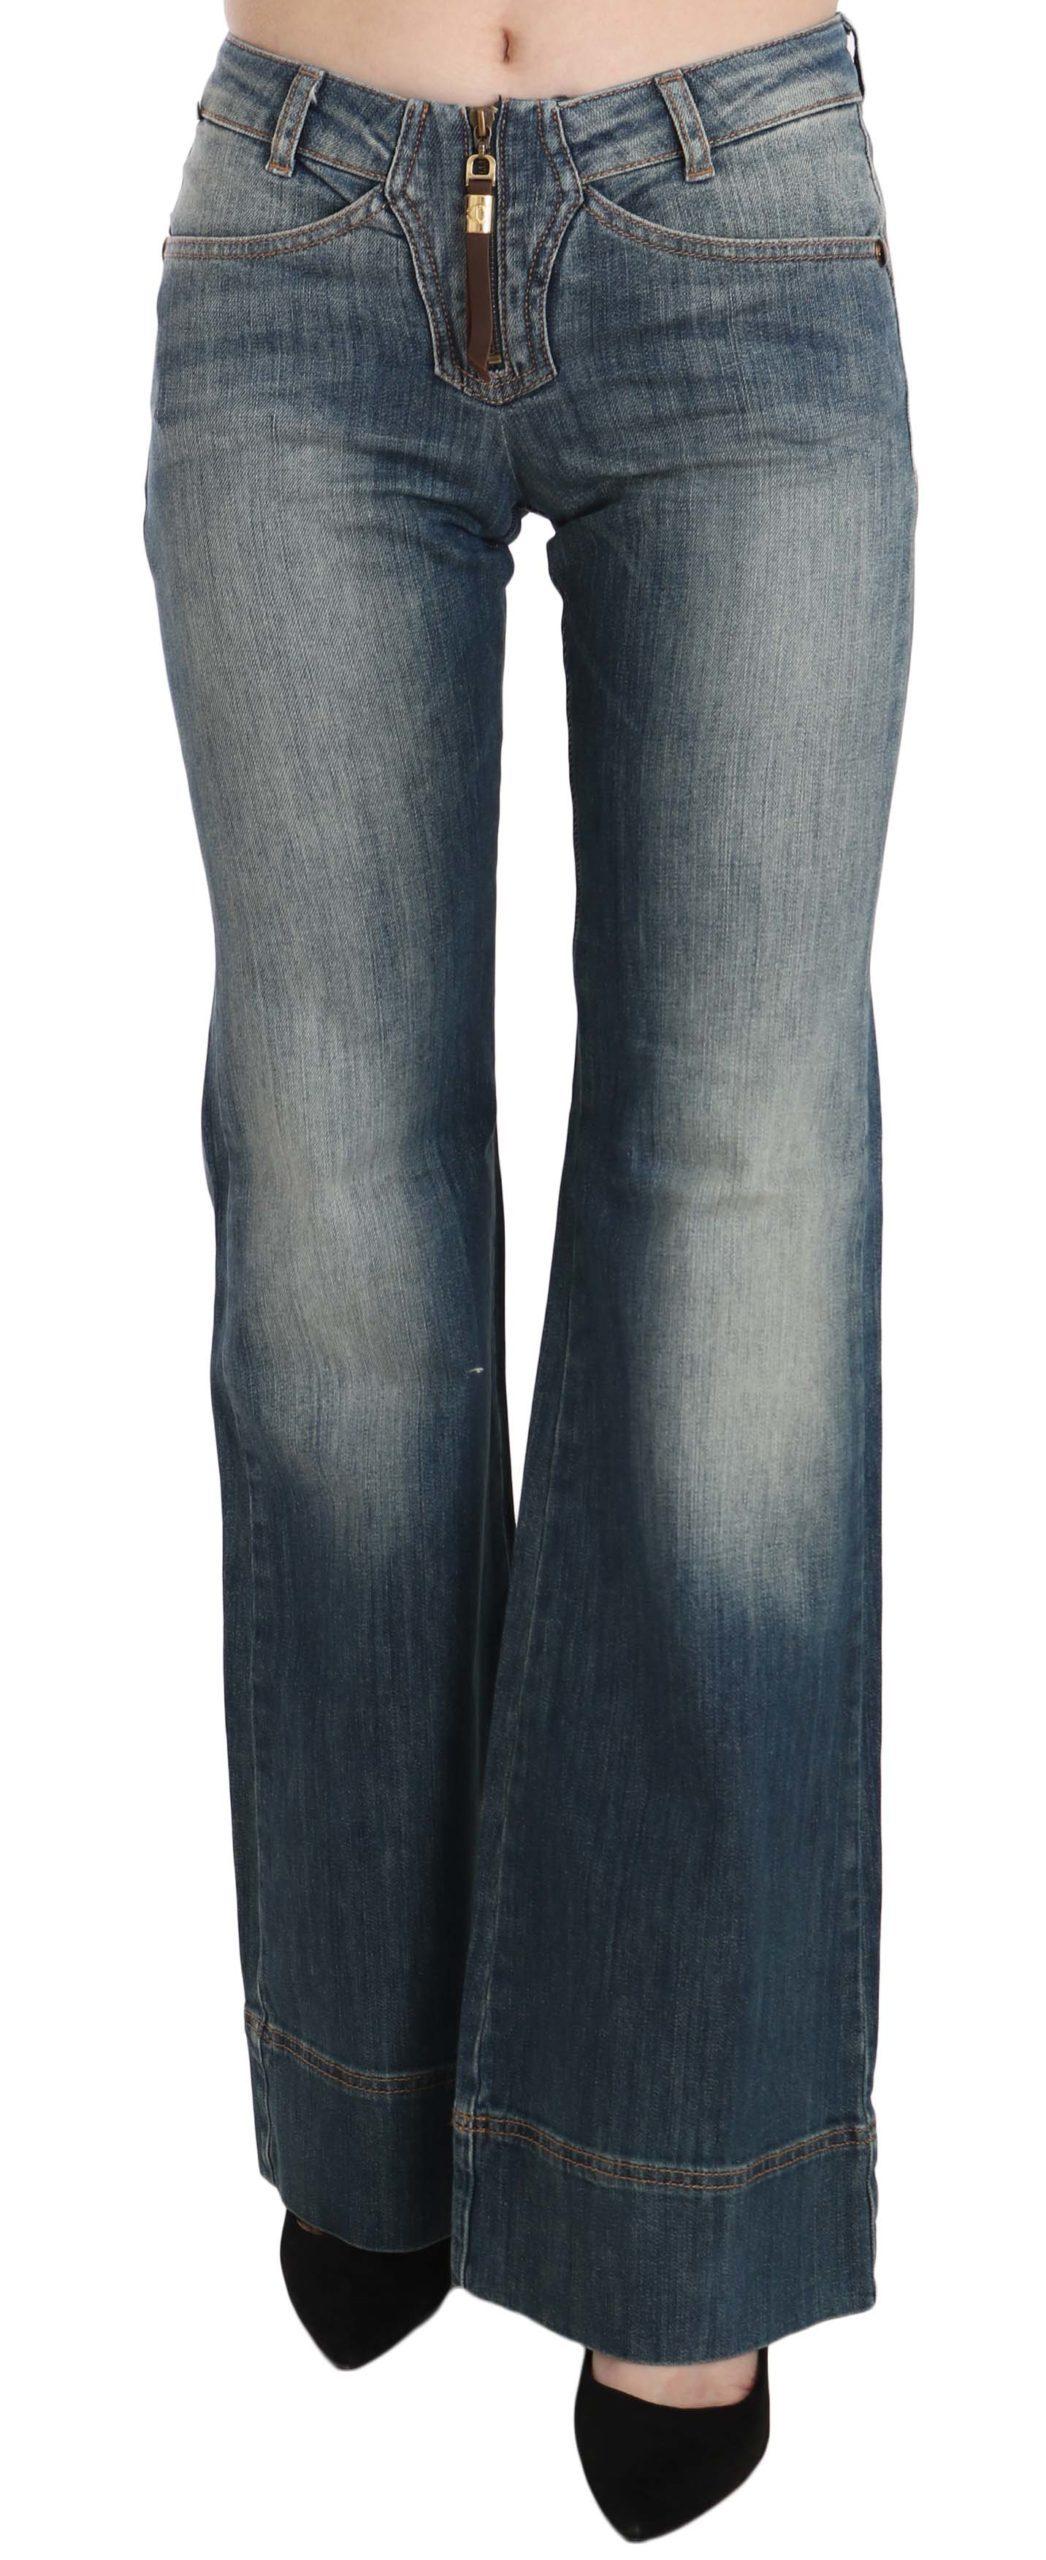 Cavalli Women's Washed Mid Waist Denim Jeans Blue PAN70349 - W24